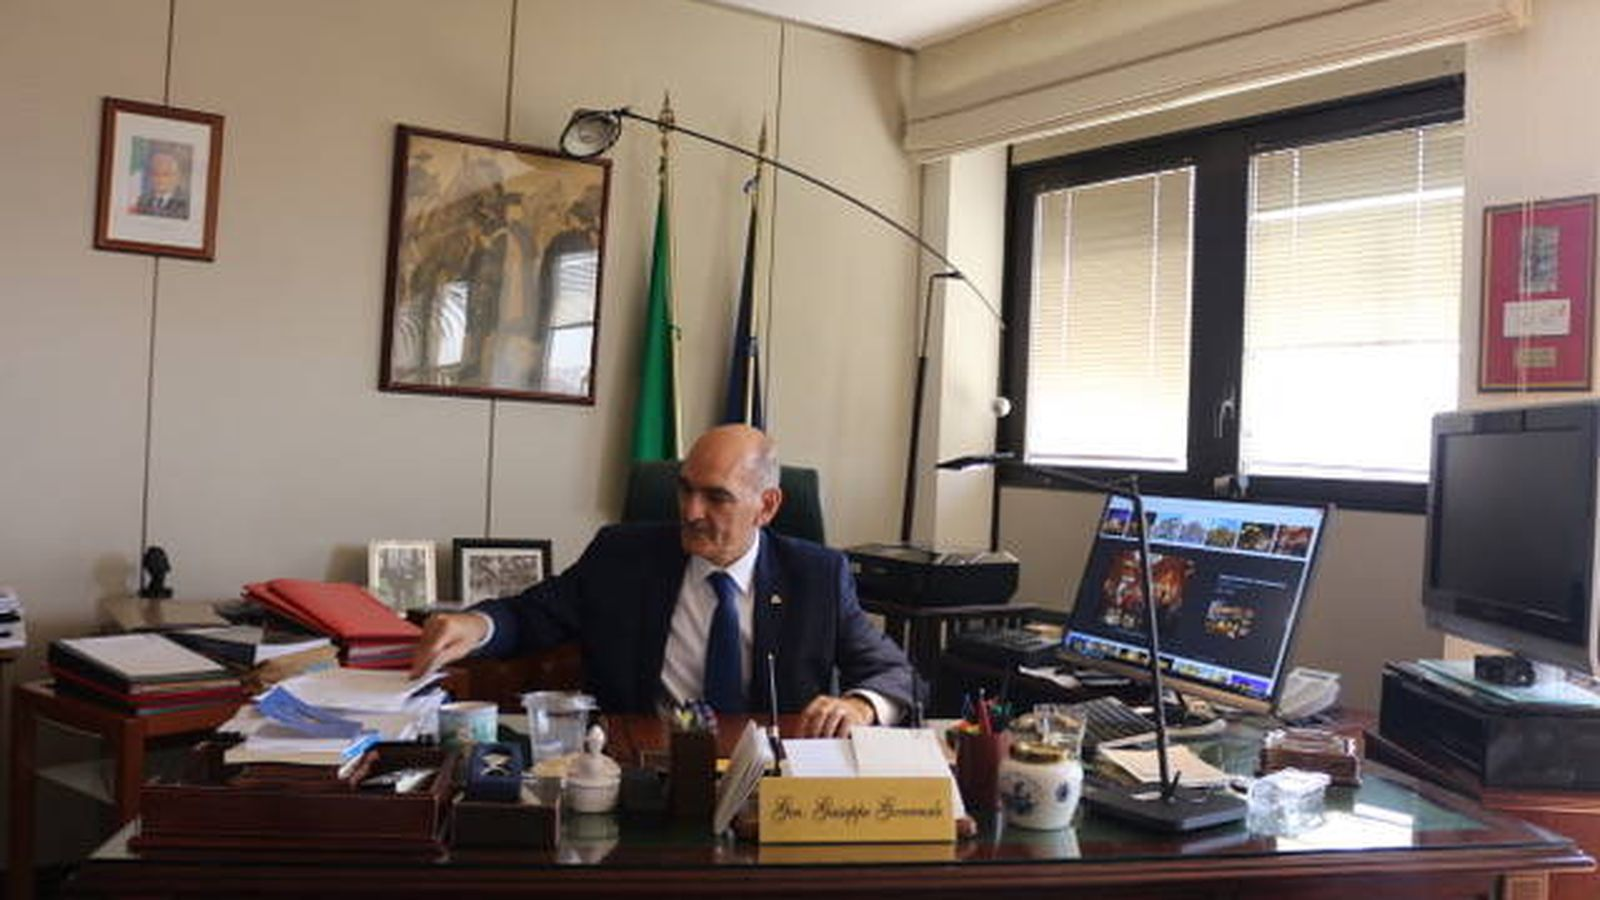 Foto: El general Giuseppe Governale, jefe de las unidades de élite de la antimafia de Italia. (Foto: I. Savio)